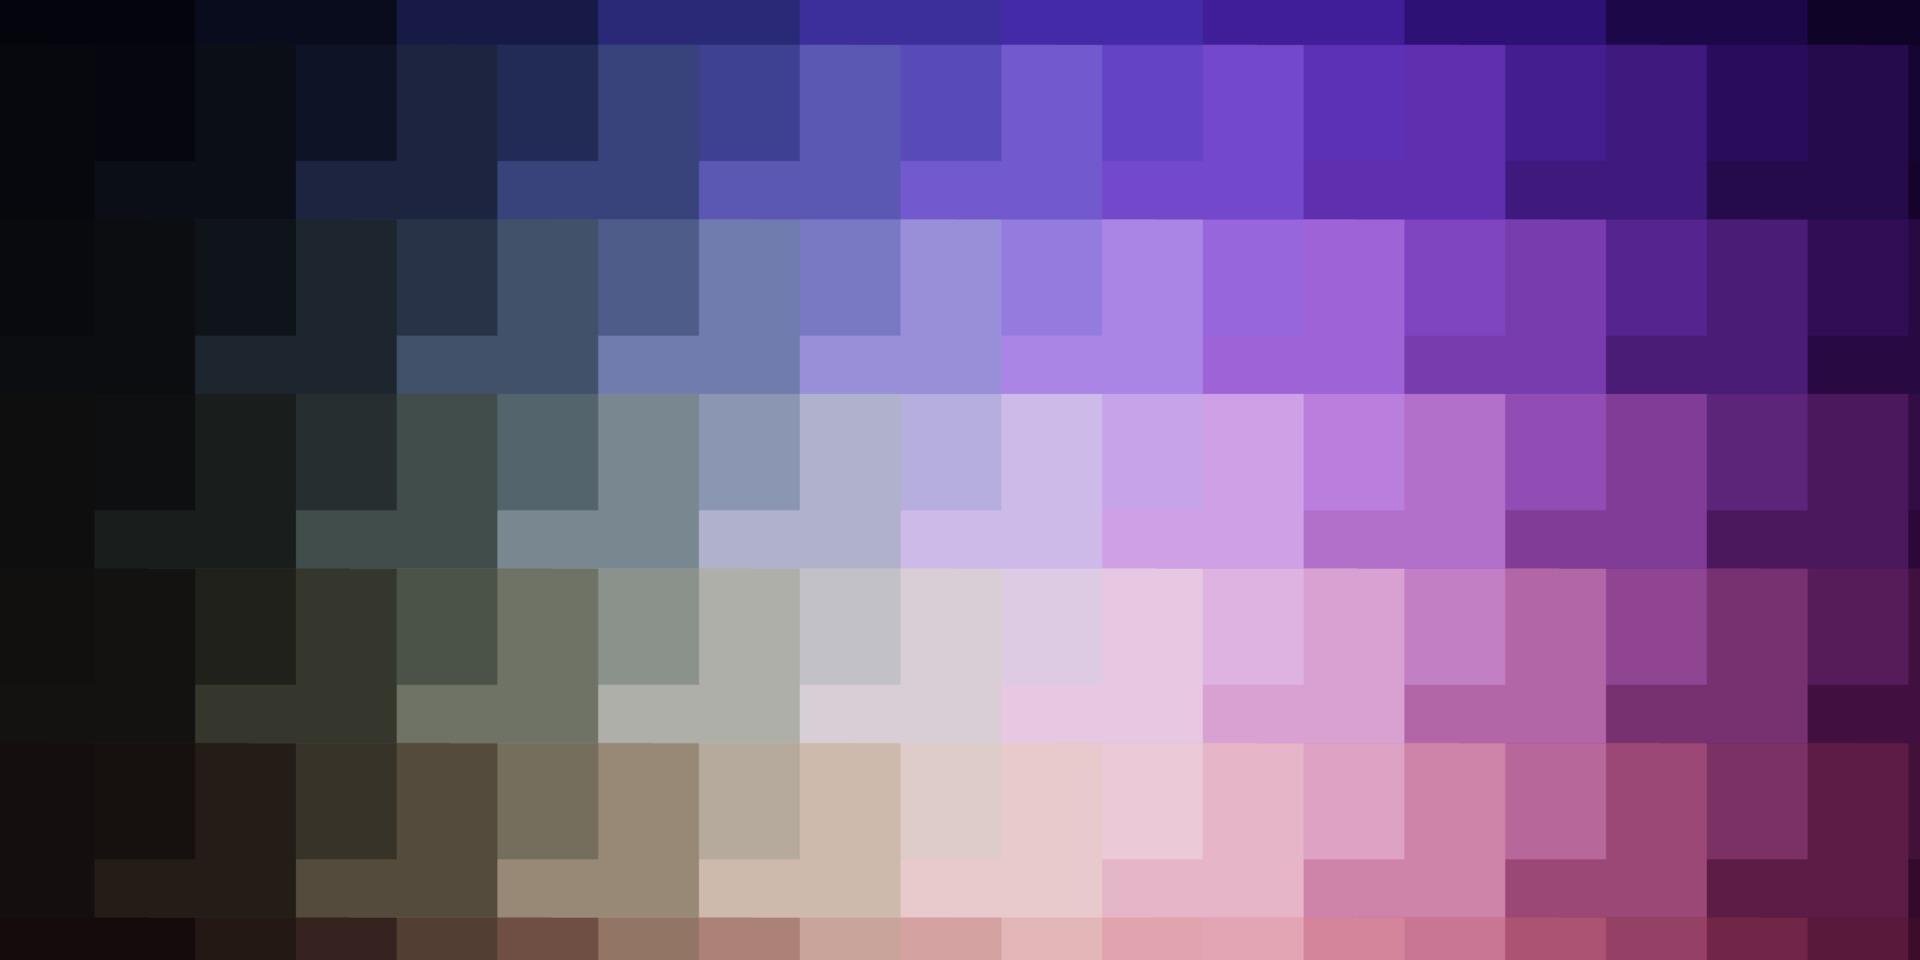 textura vector rosa claro, verde em estilo retangular.